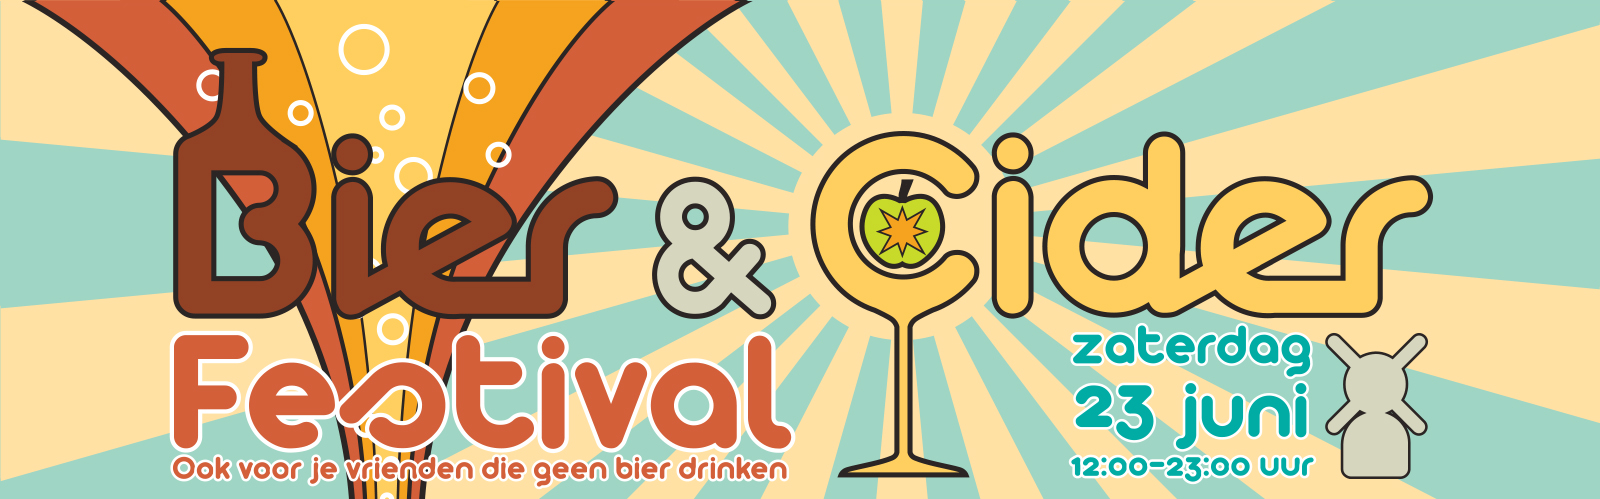 Bier-en-Cider-festival-header-2